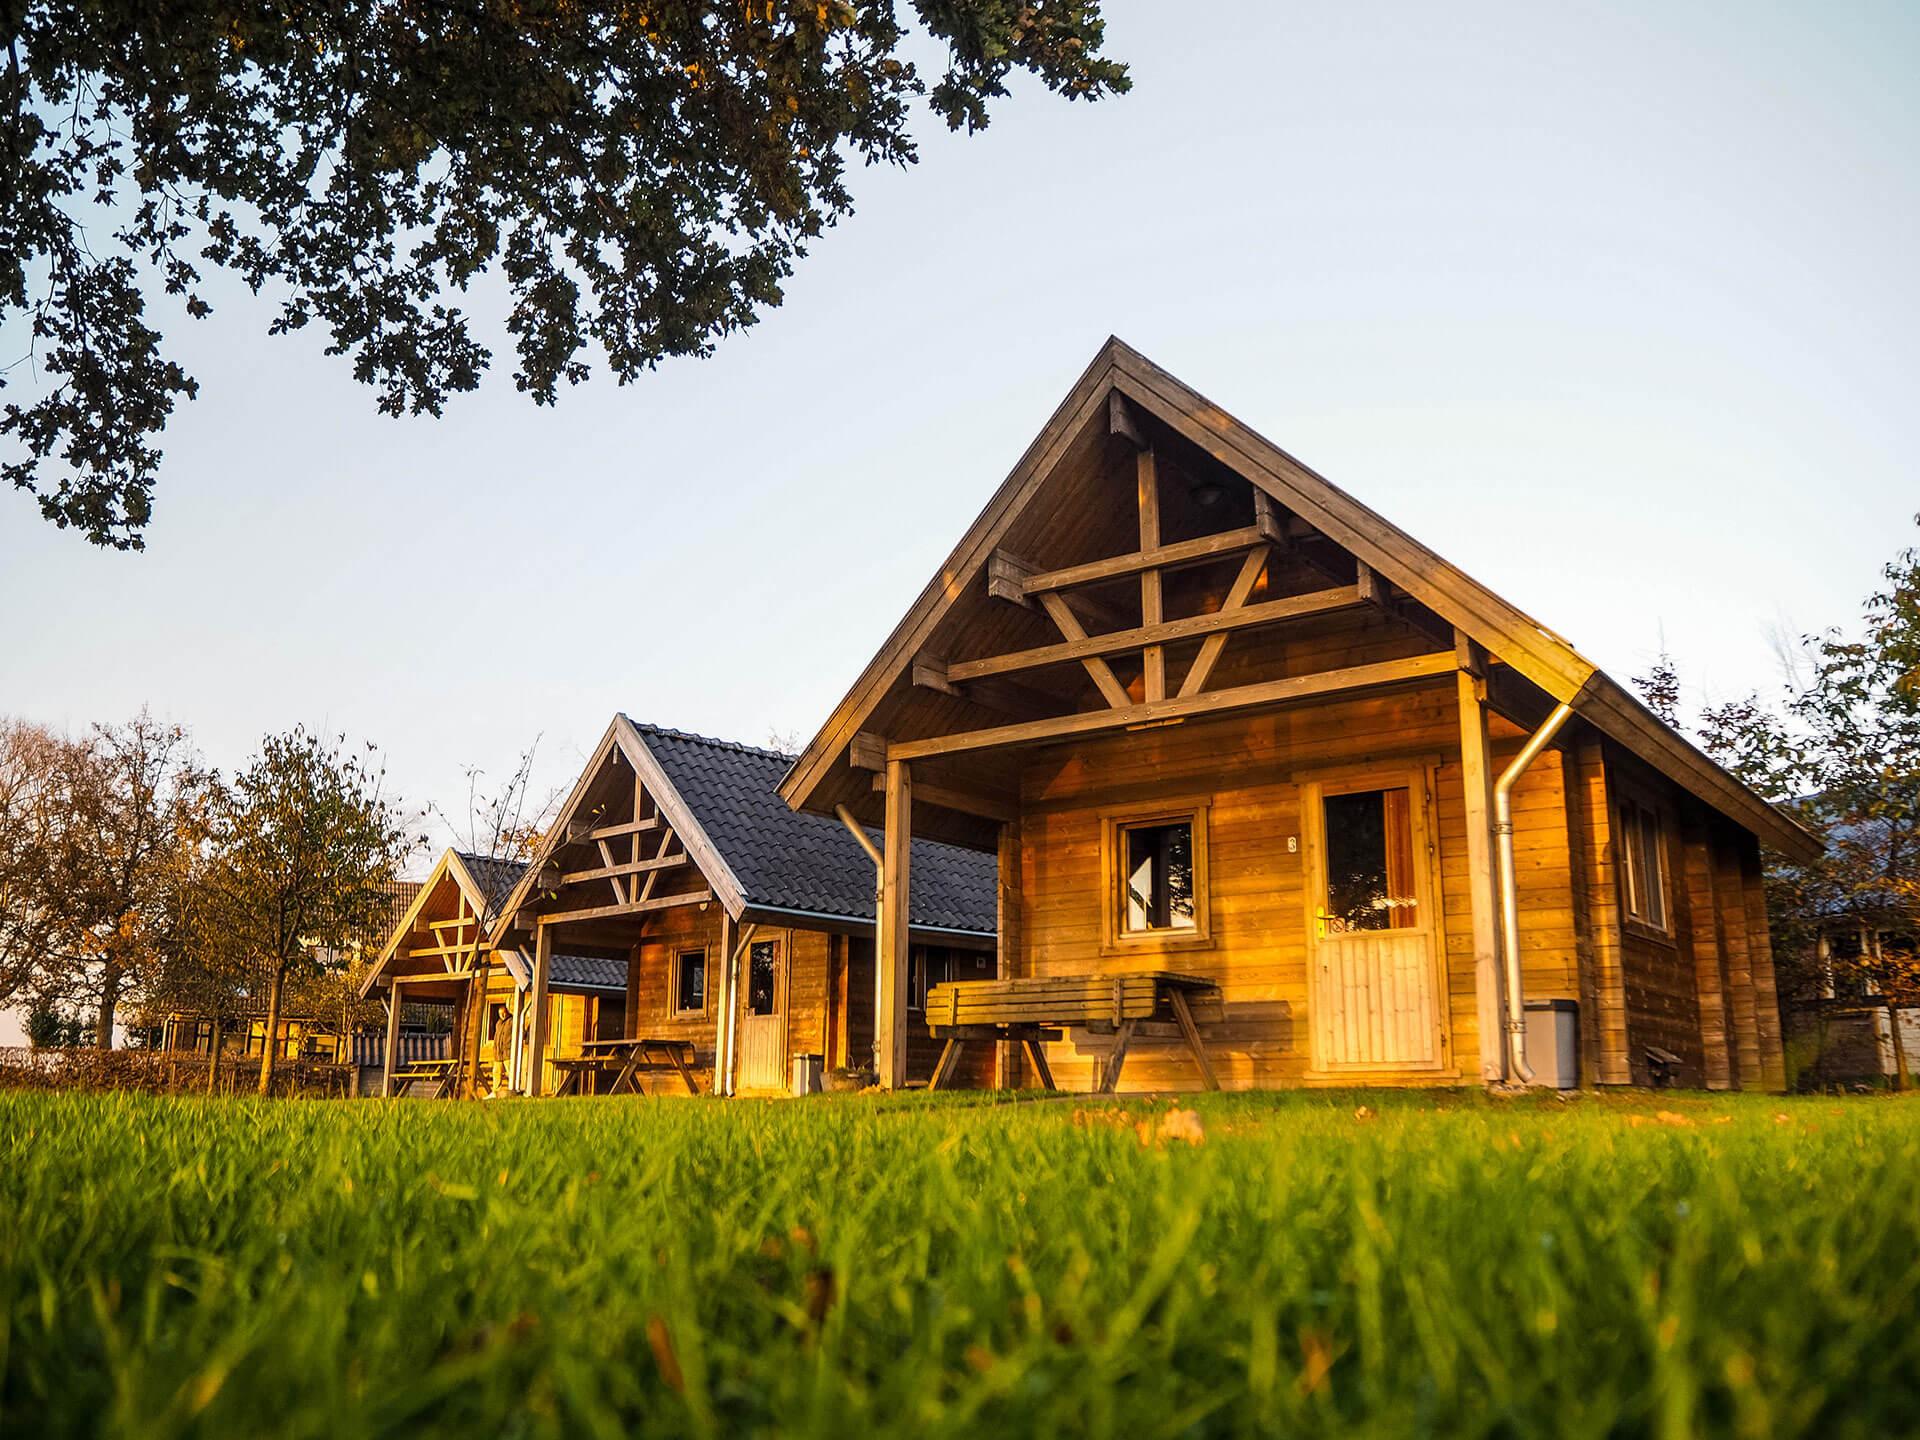 Blokhut op camping Wisbroek houten blokhuis als trekkershut of tiny house